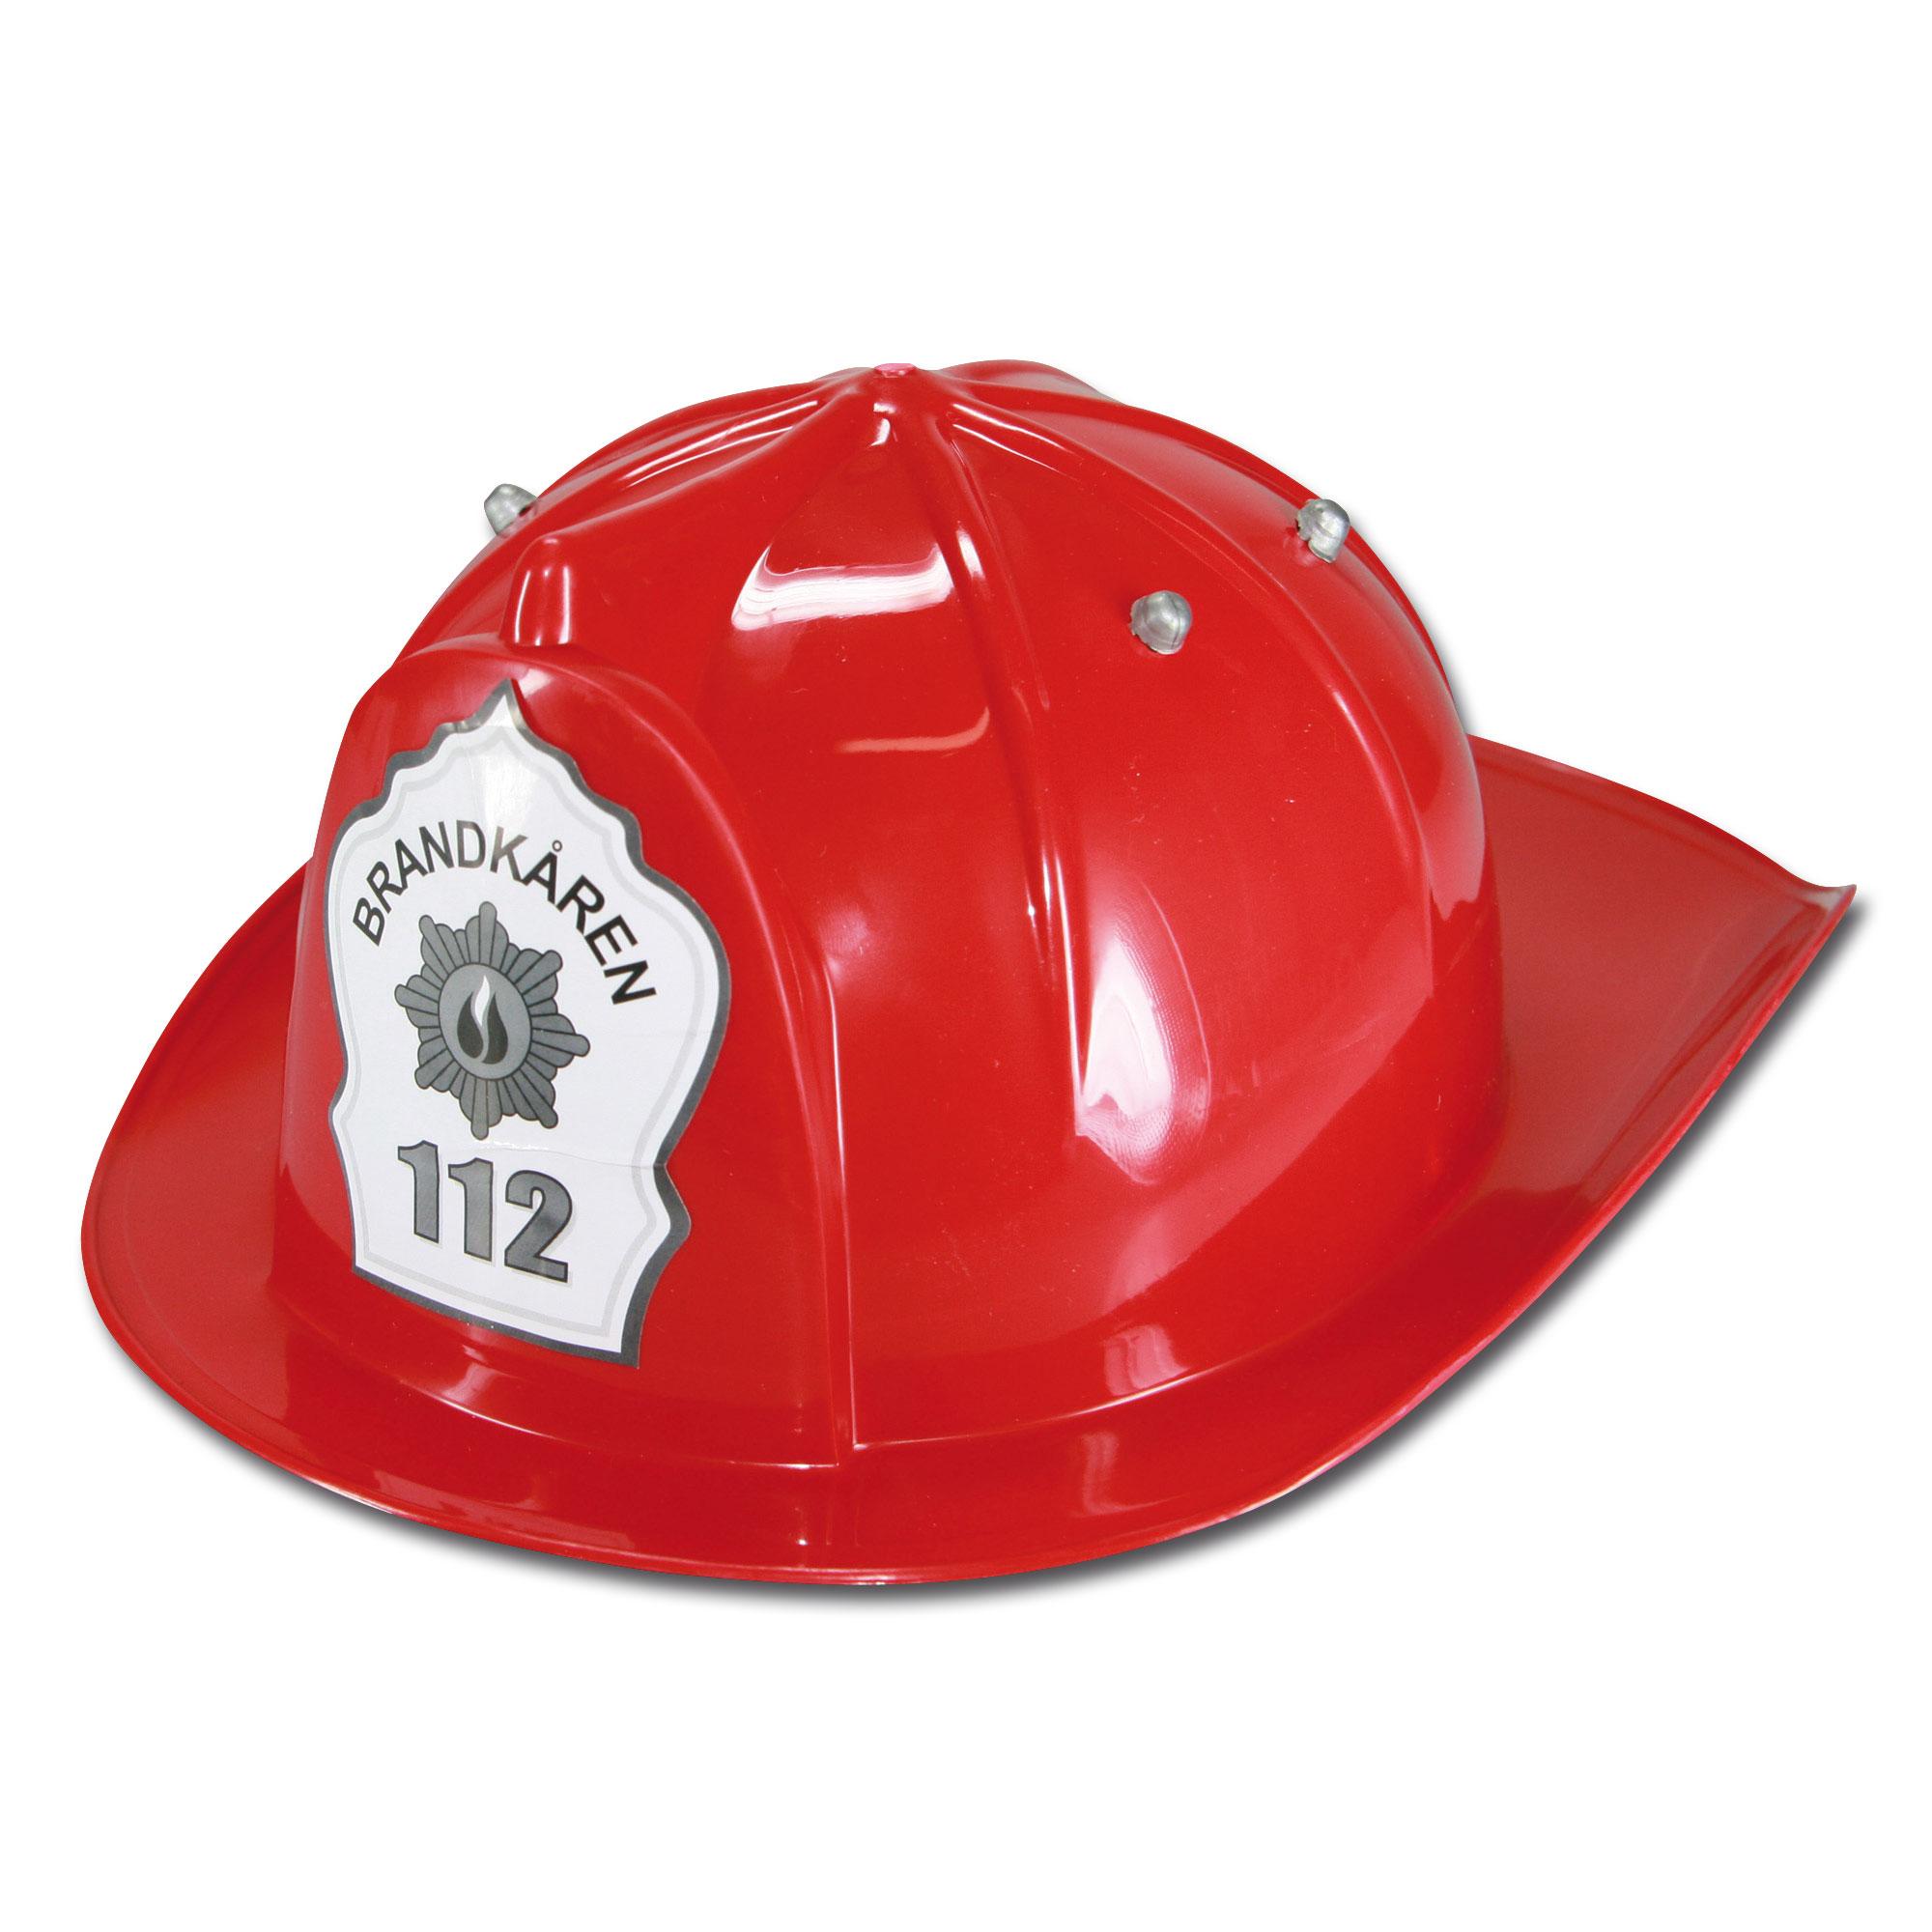 Kinder Feuerwehrhelm rot